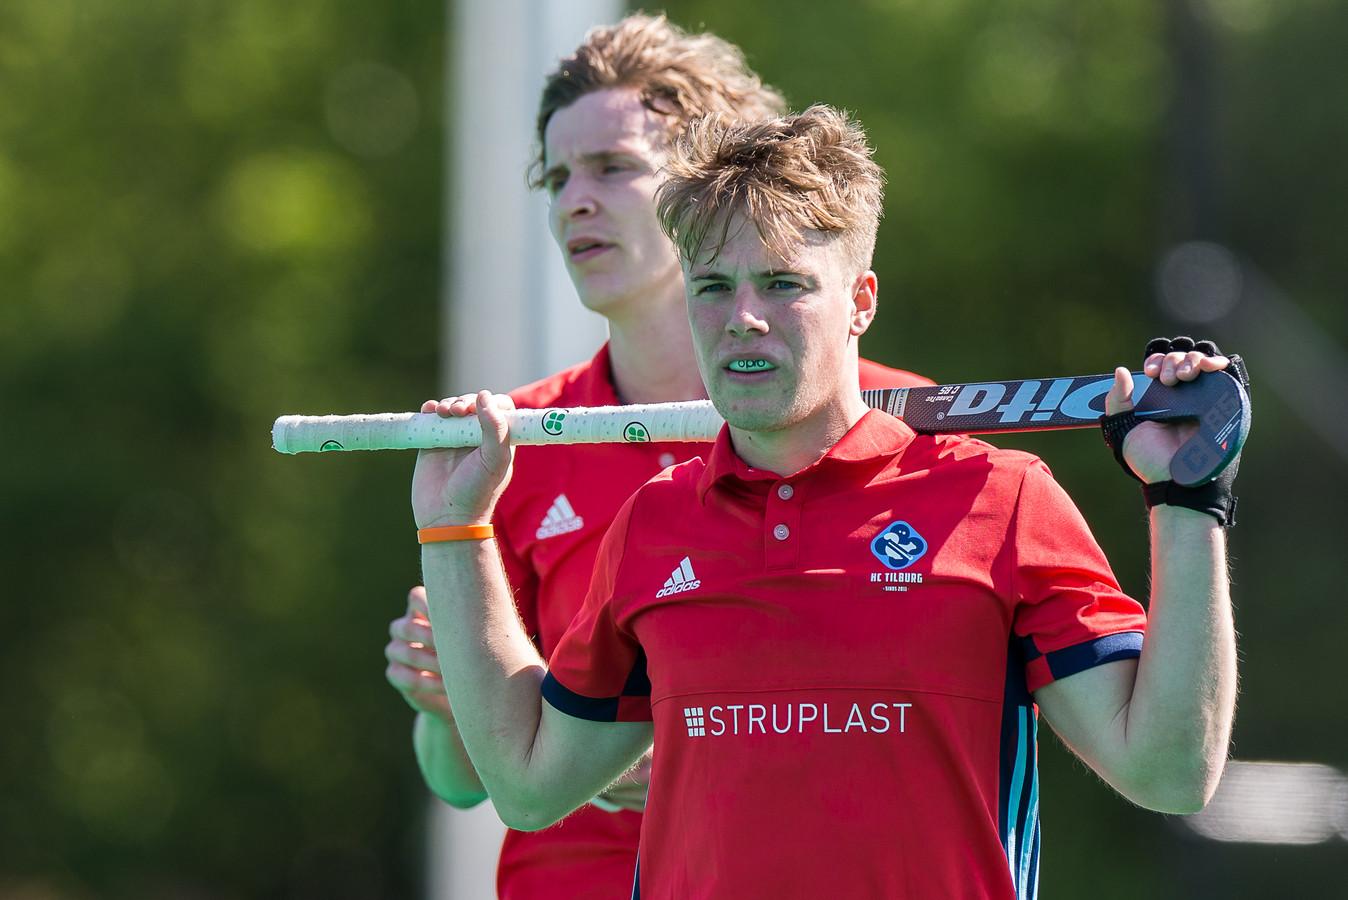 Gareth Furlong van HC Tilburg